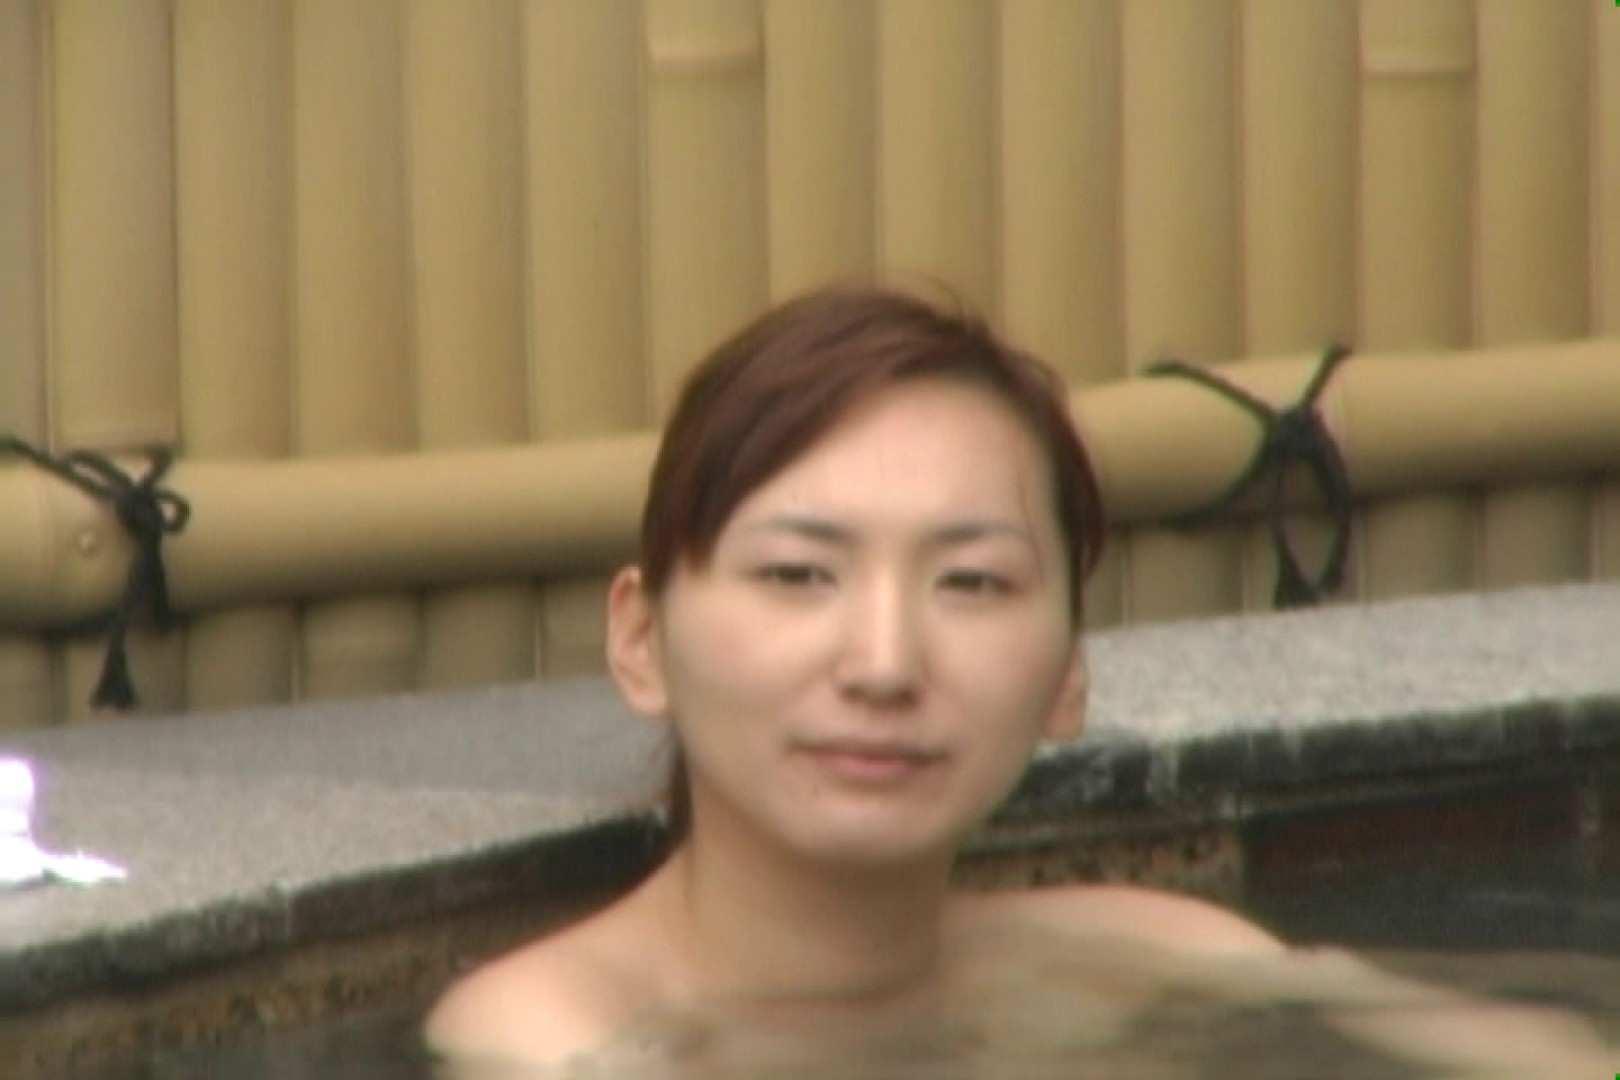 Aquaな露天風呂Vol.616 露天風呂編   盗撮シリーズ  89PIX 73